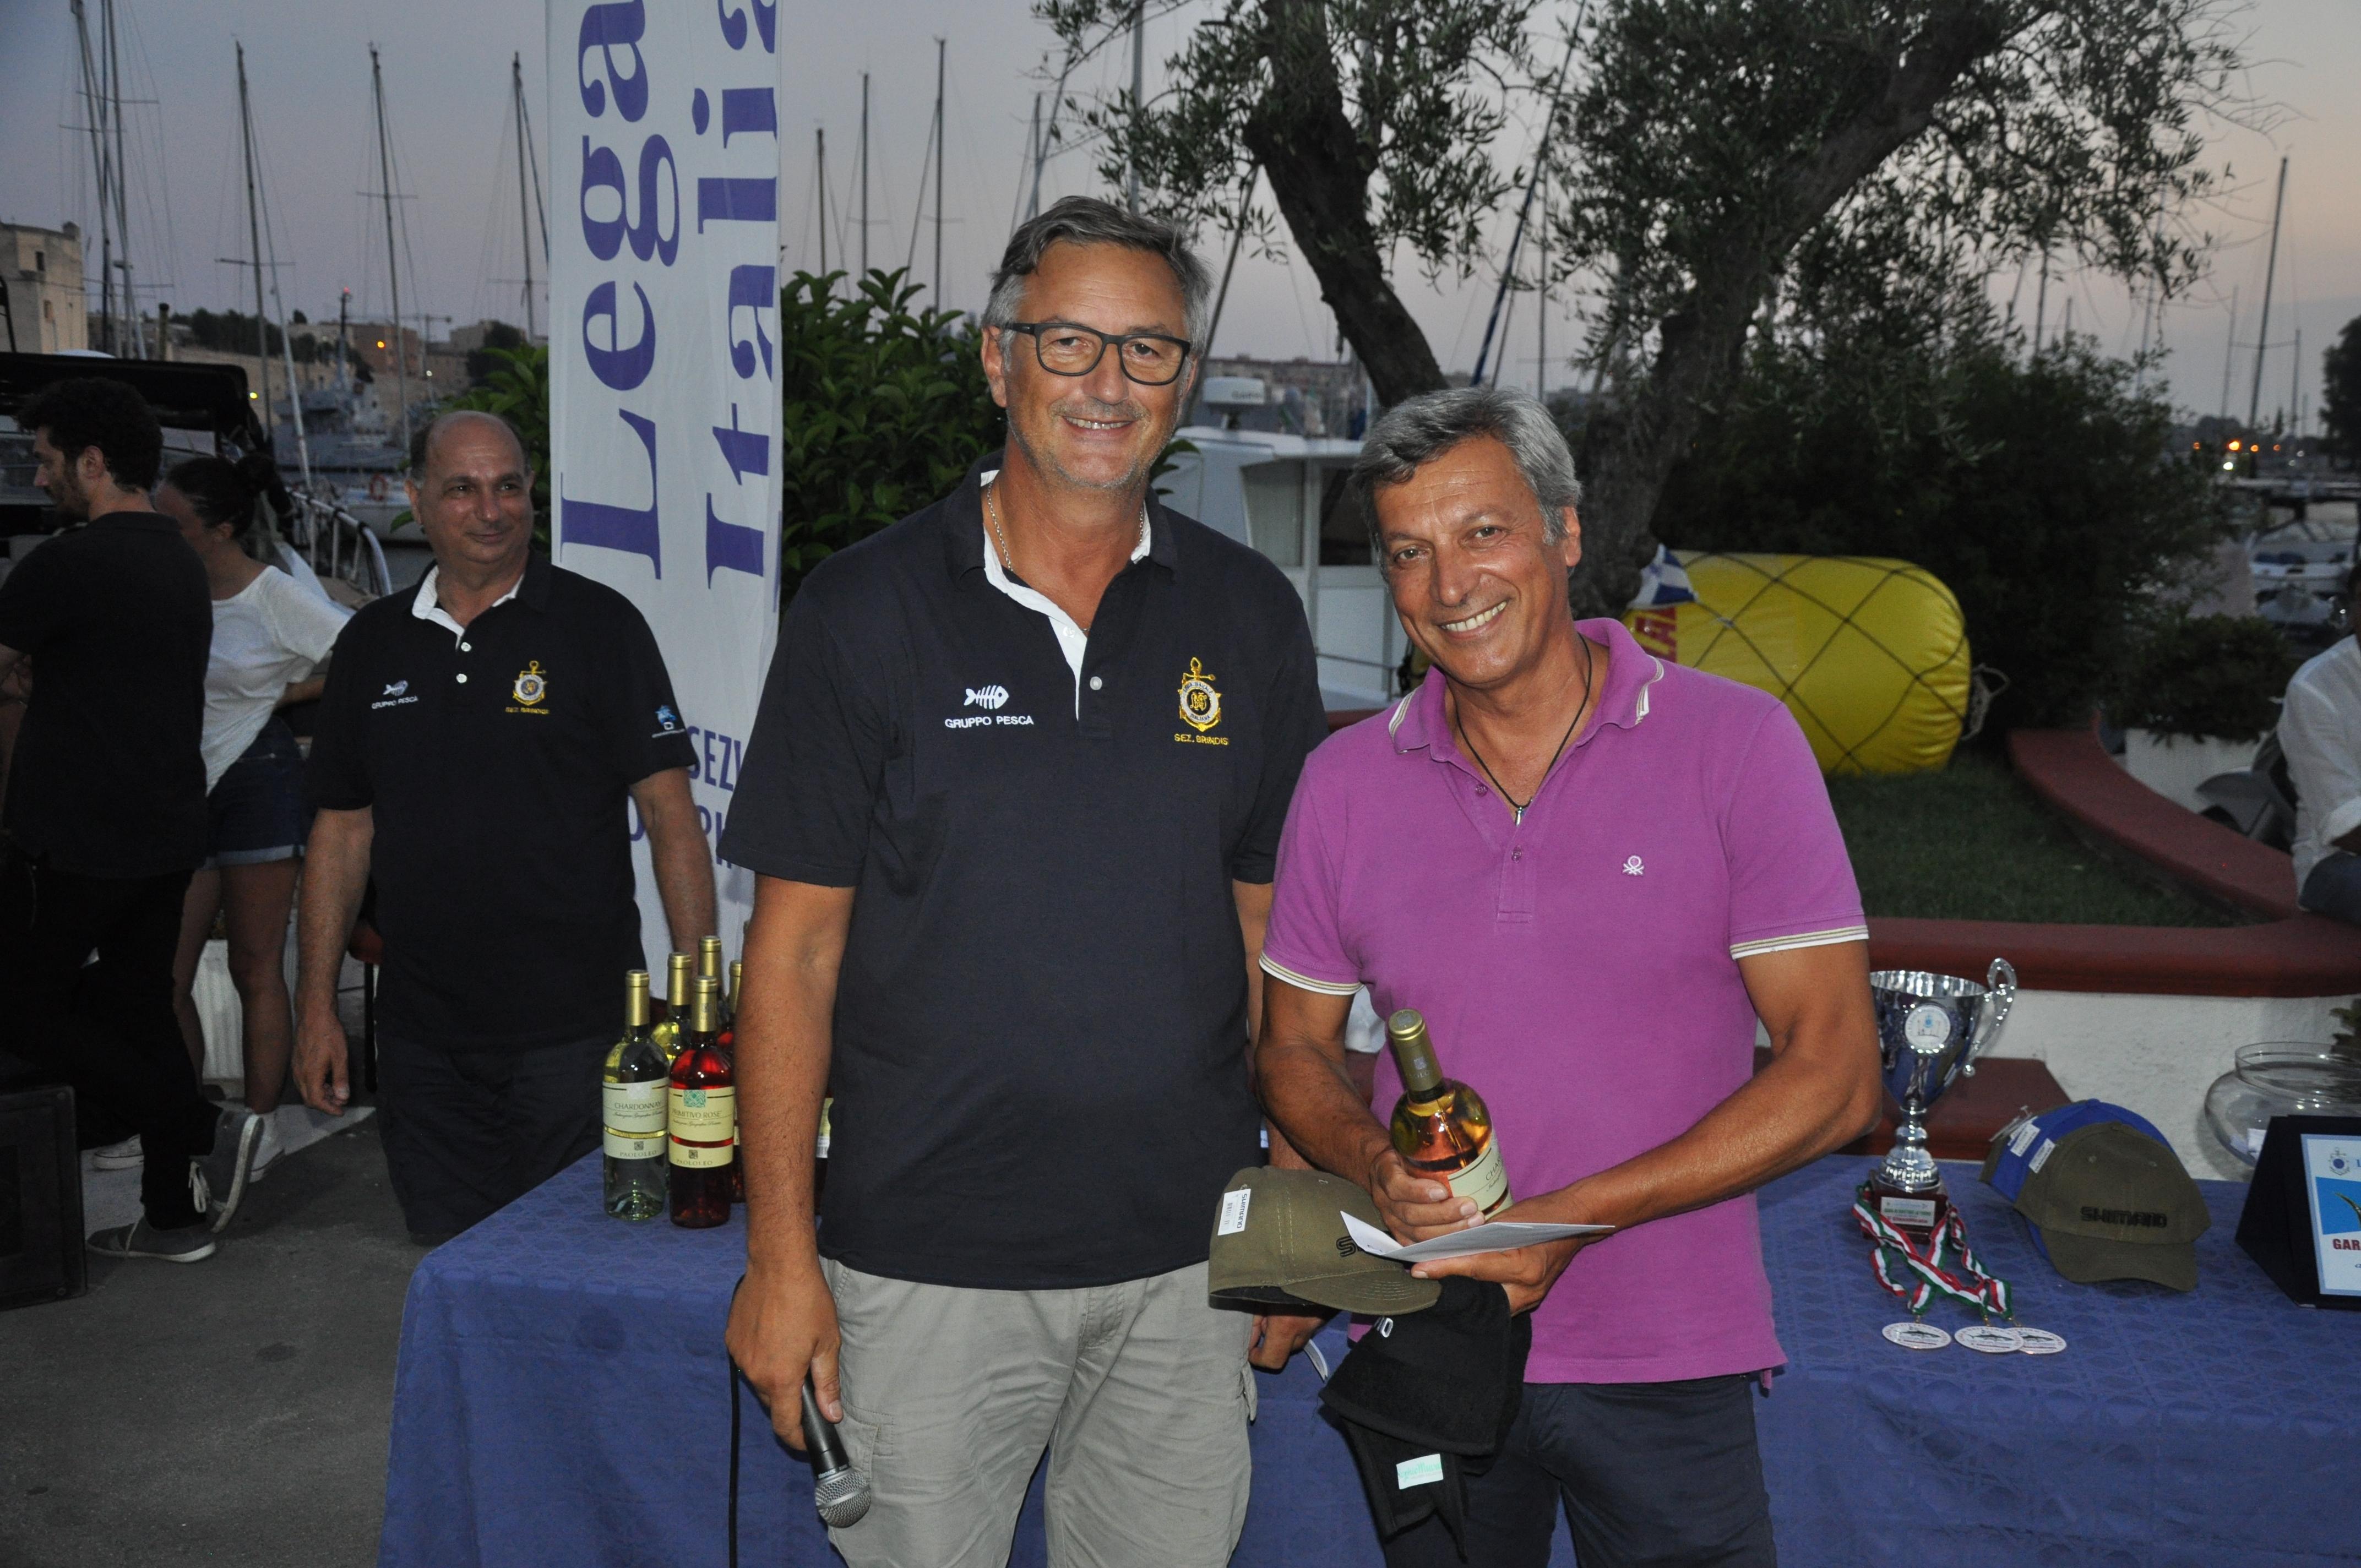 premiazione drifting al tonno 2018 (9)